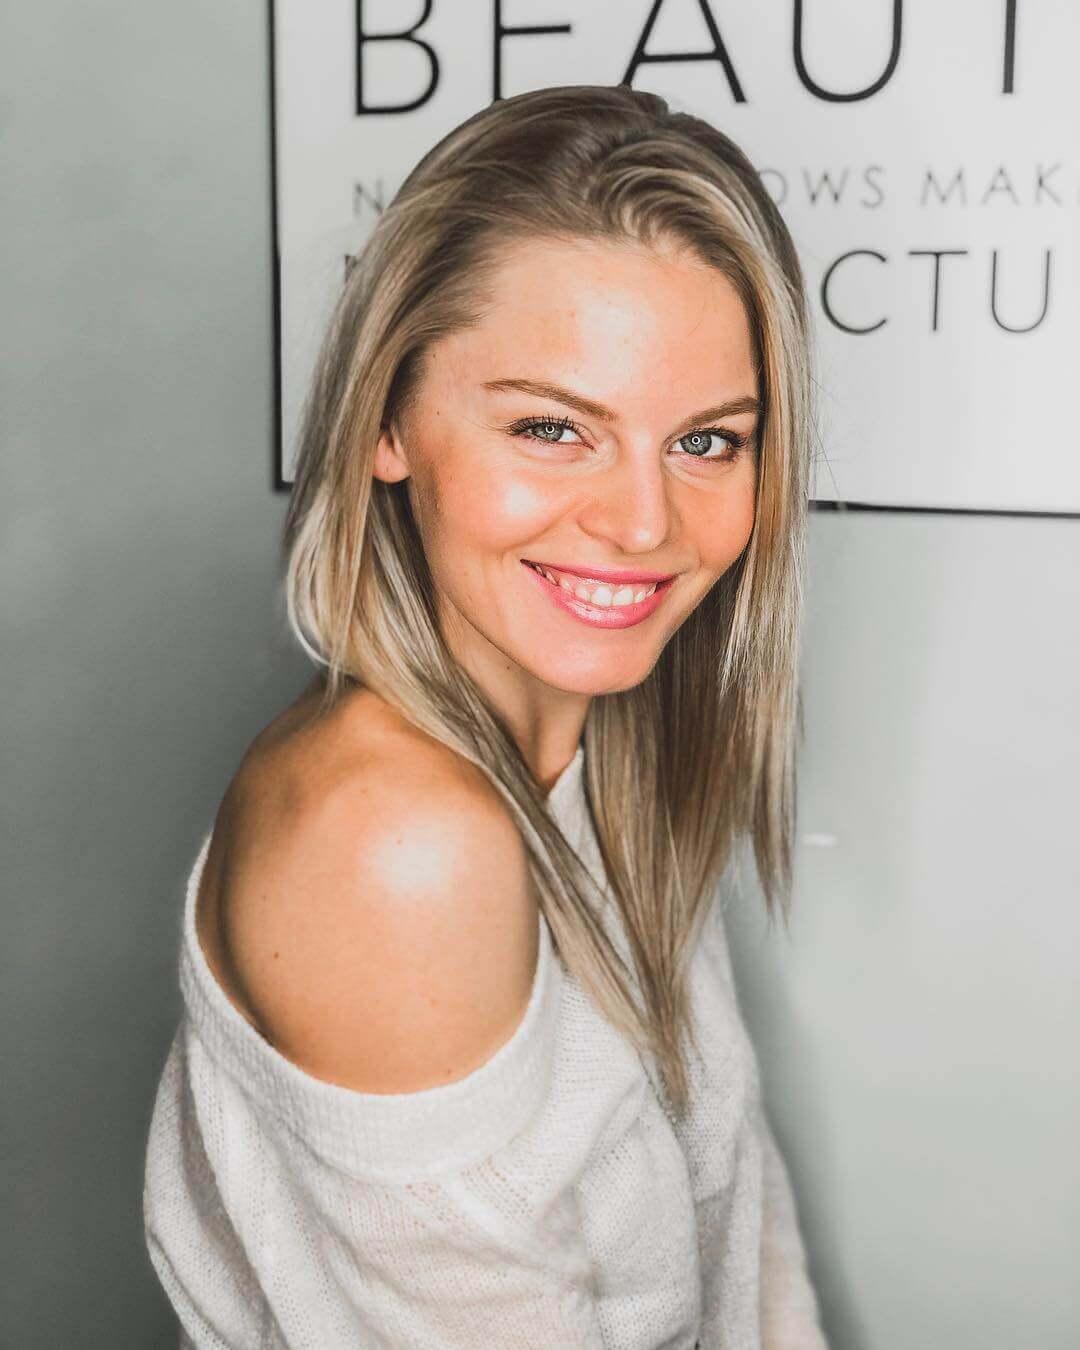 Анастасия Стежко: как живет талантливая актриса и кем оказался её муж